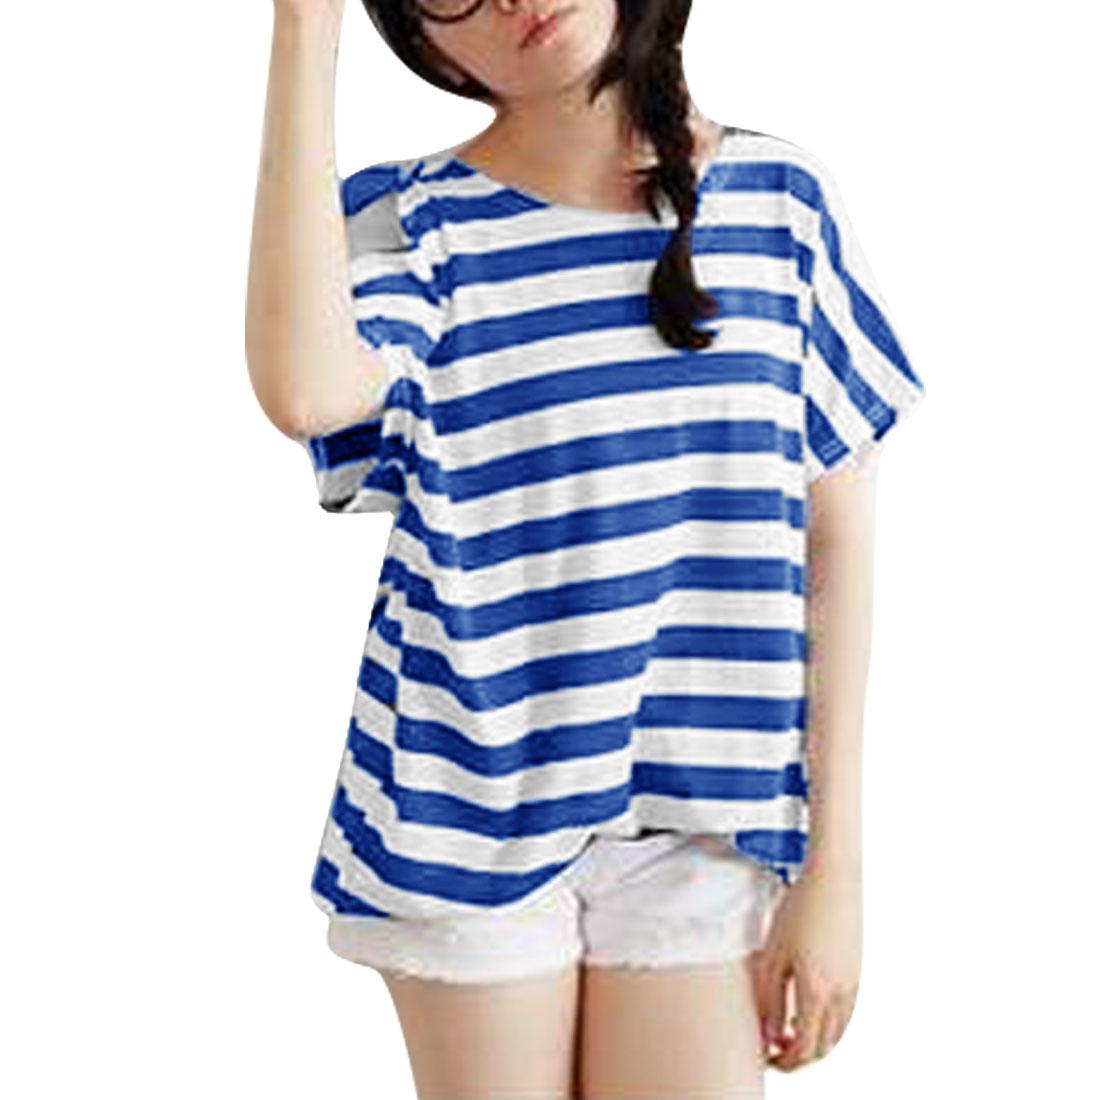 Women Korea Fashion Short Dolman Sleeve Stripes Prints Royalblue White Top M